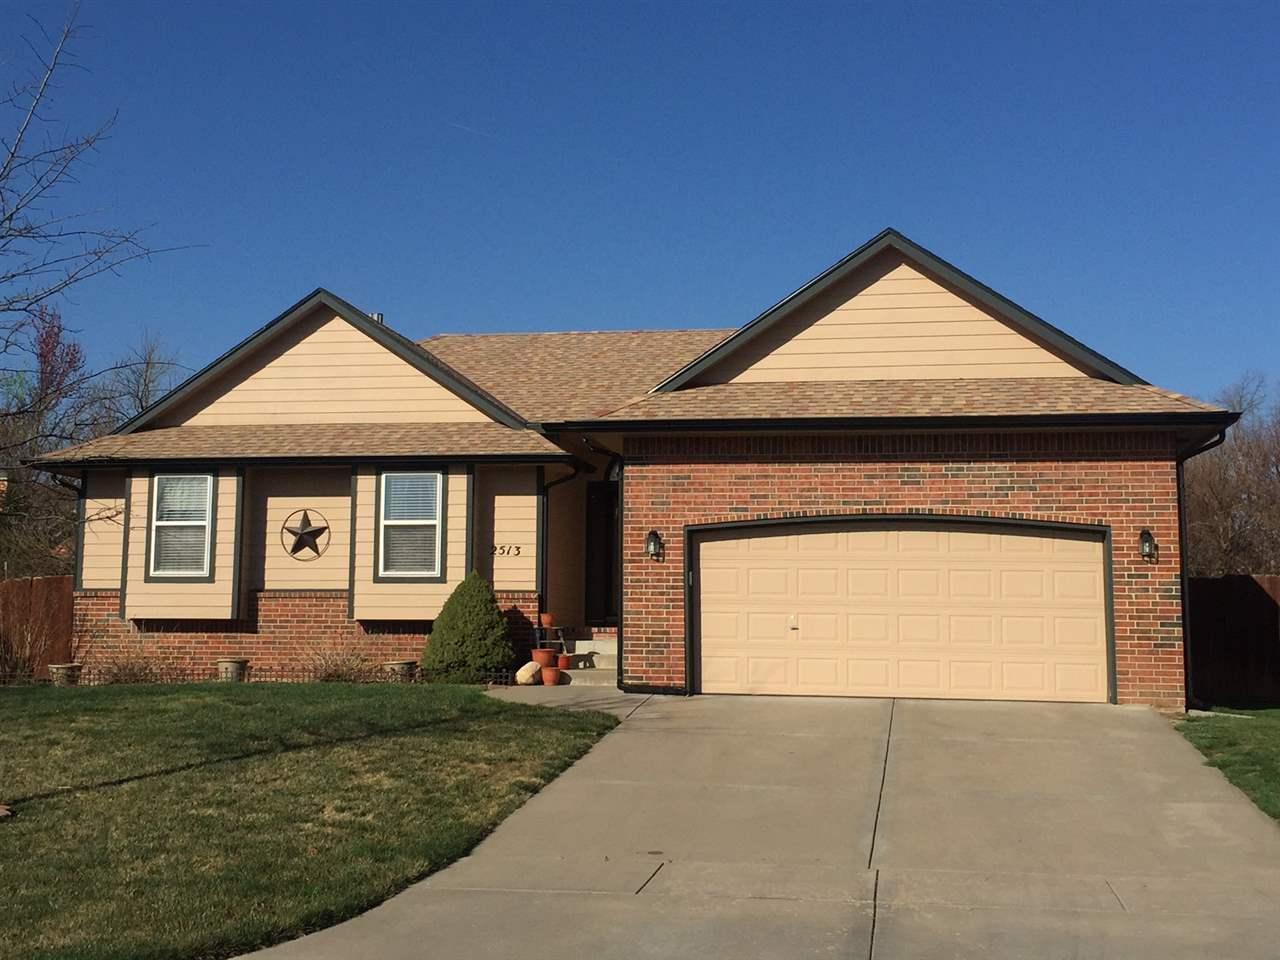 2513 N Brandon Circle, Wichita, KS 67226